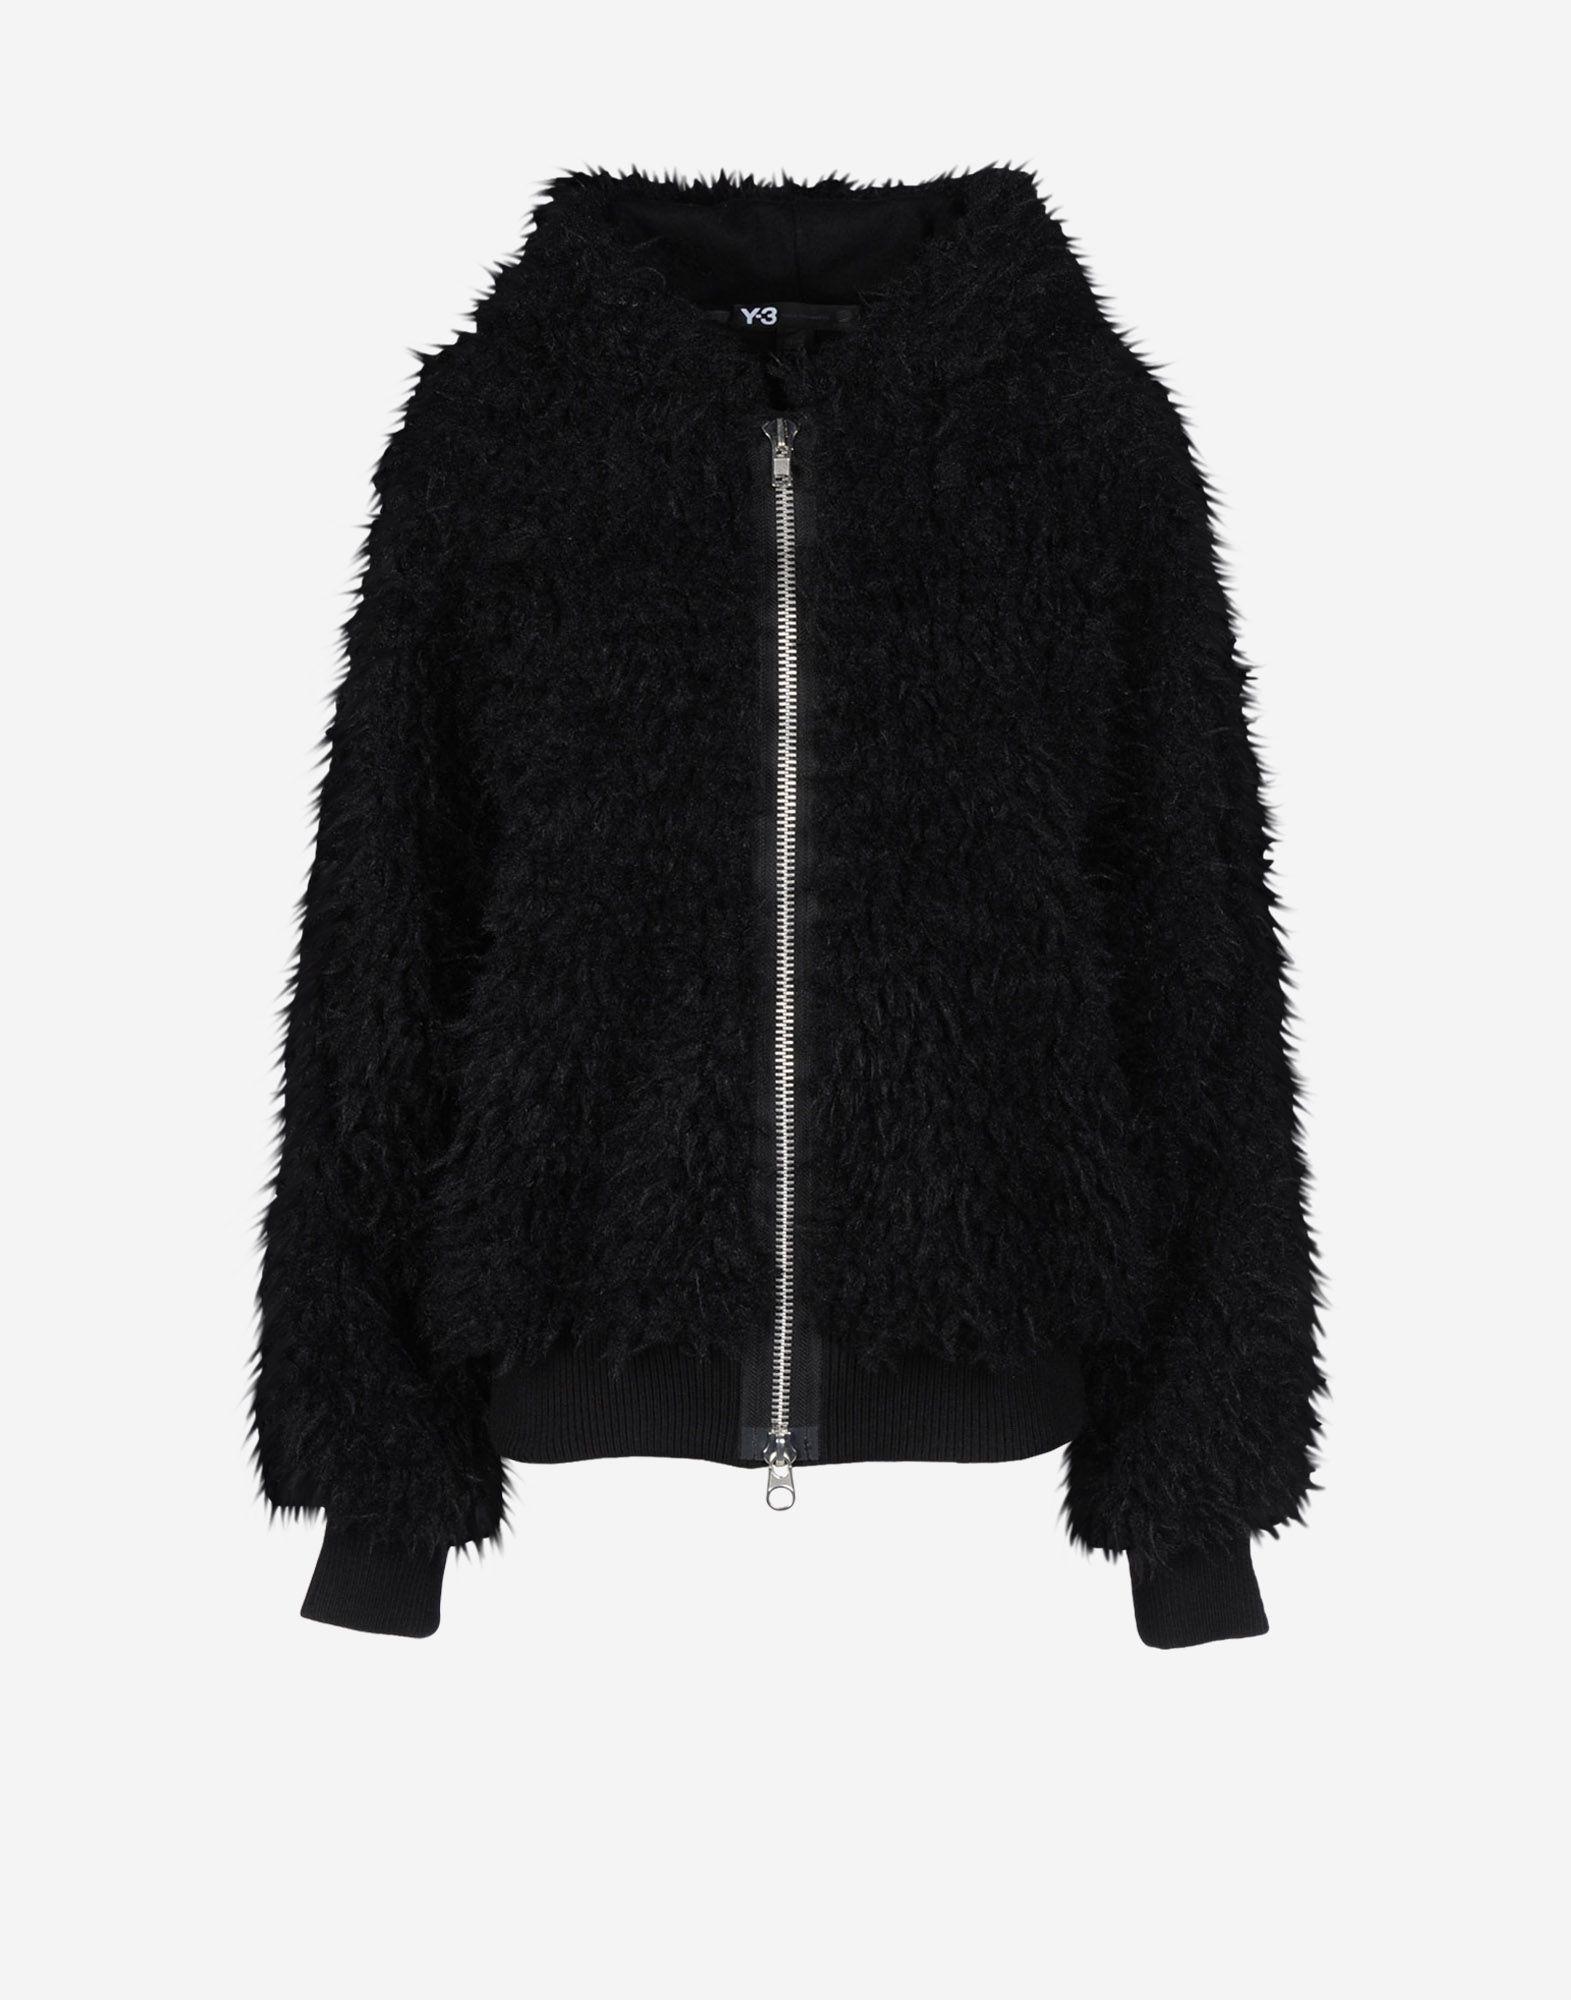 08160be3b  Y 3 Fur Jacket Jackets | Adidas Y-3 Official Site